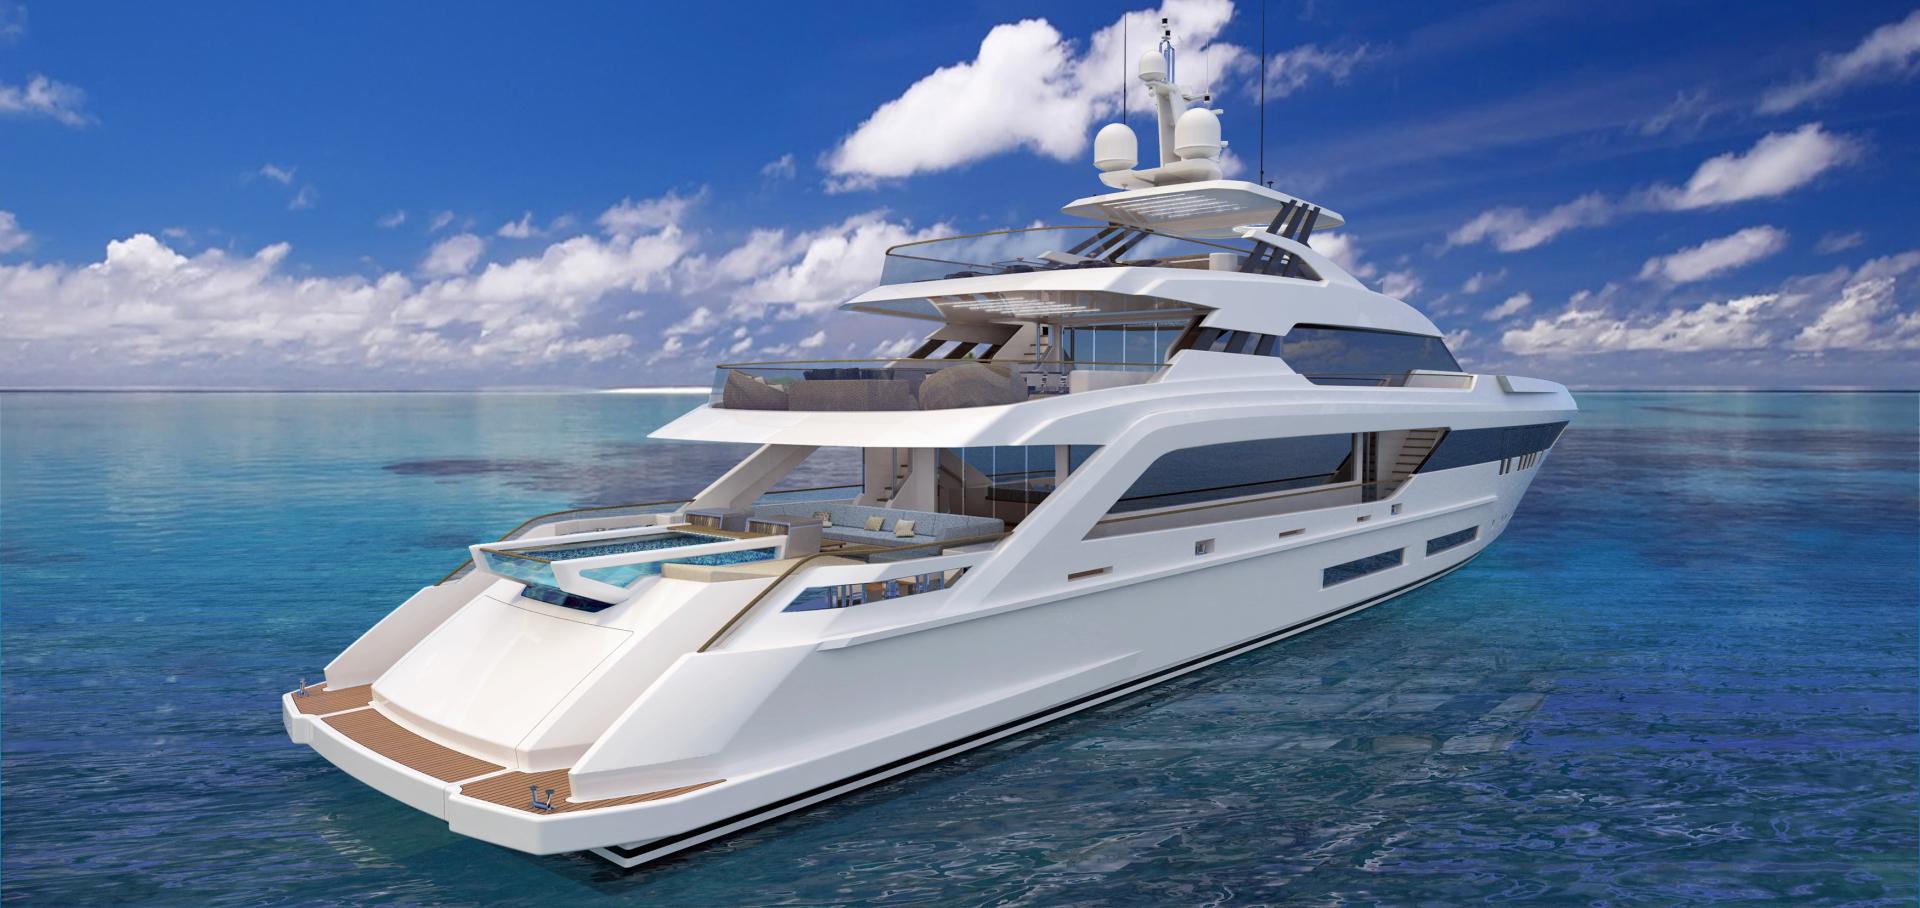 GHI Yachts 2023-THUNDERBIRD 165 Korea, Republic of-1337227 | Thumbnail